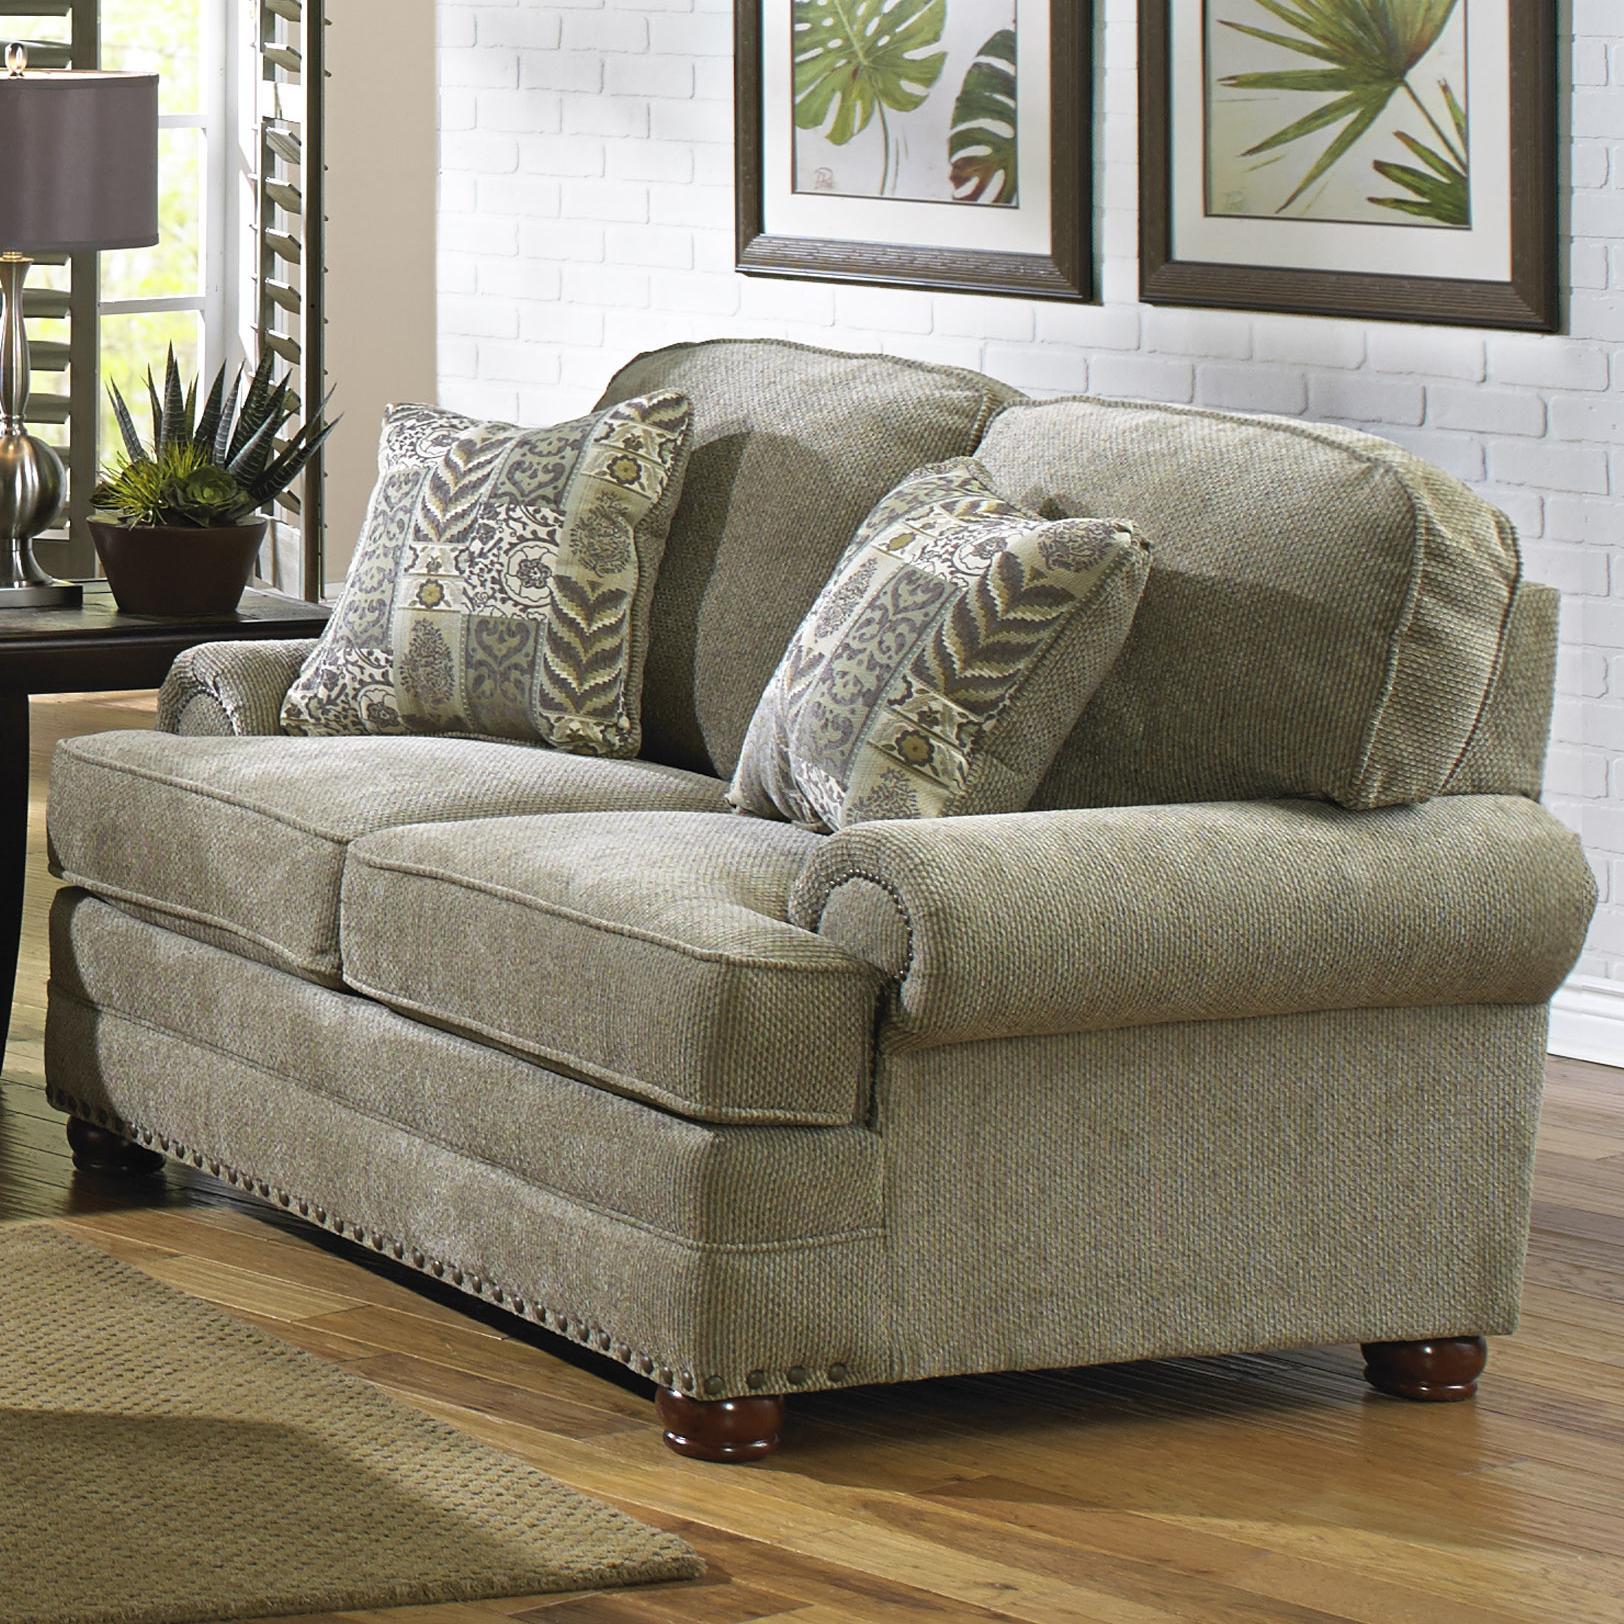 Jackson Furniture Braddock Loveseat - Item Number: 4238-02 Mineral